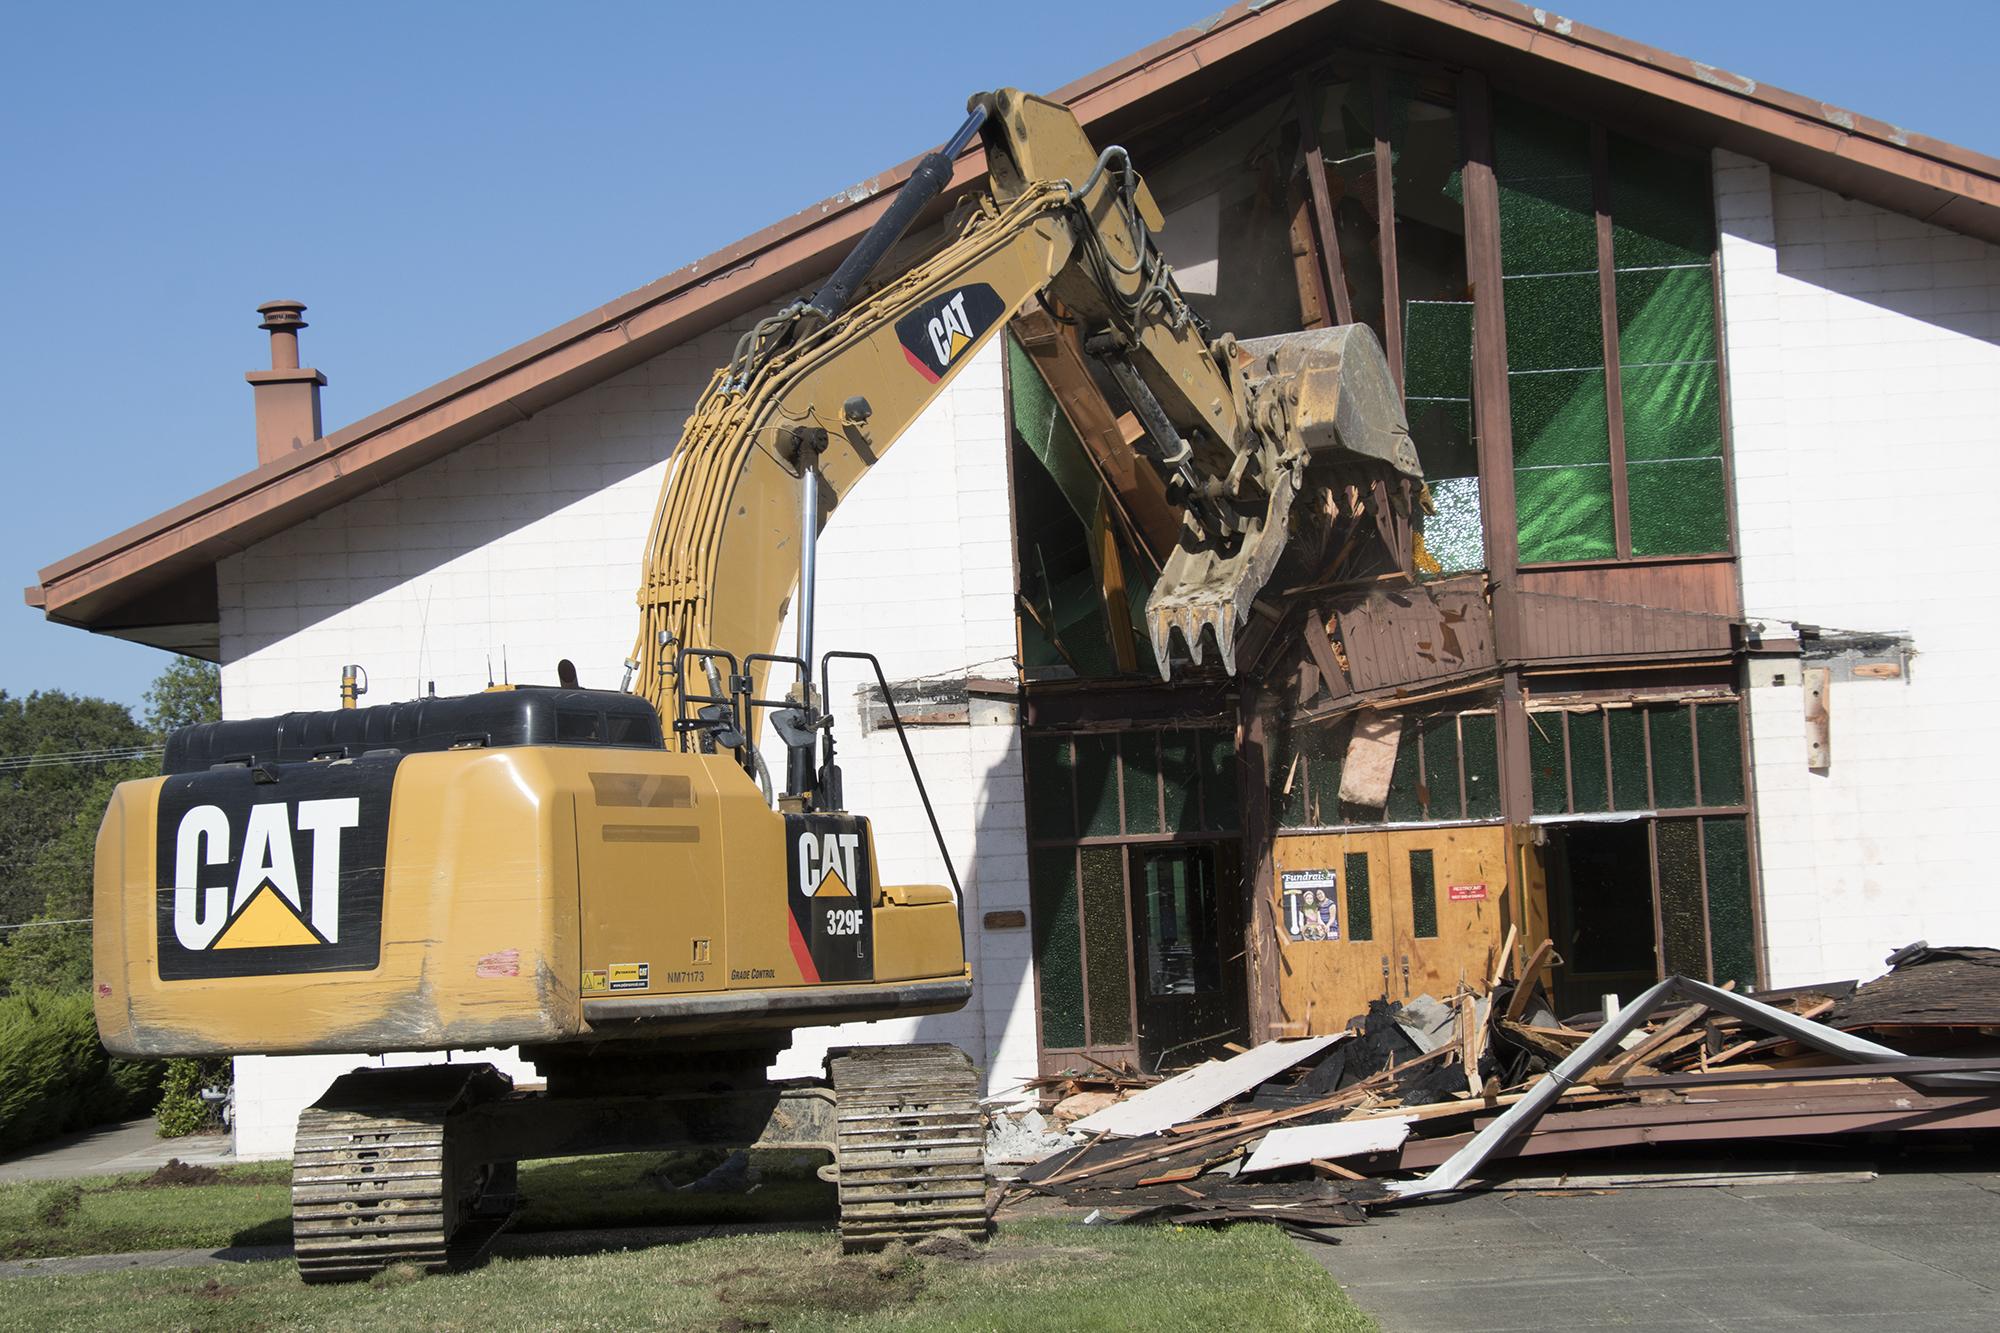 Beginning of demolition. Photo courtesy of Fr. William Holtzinger